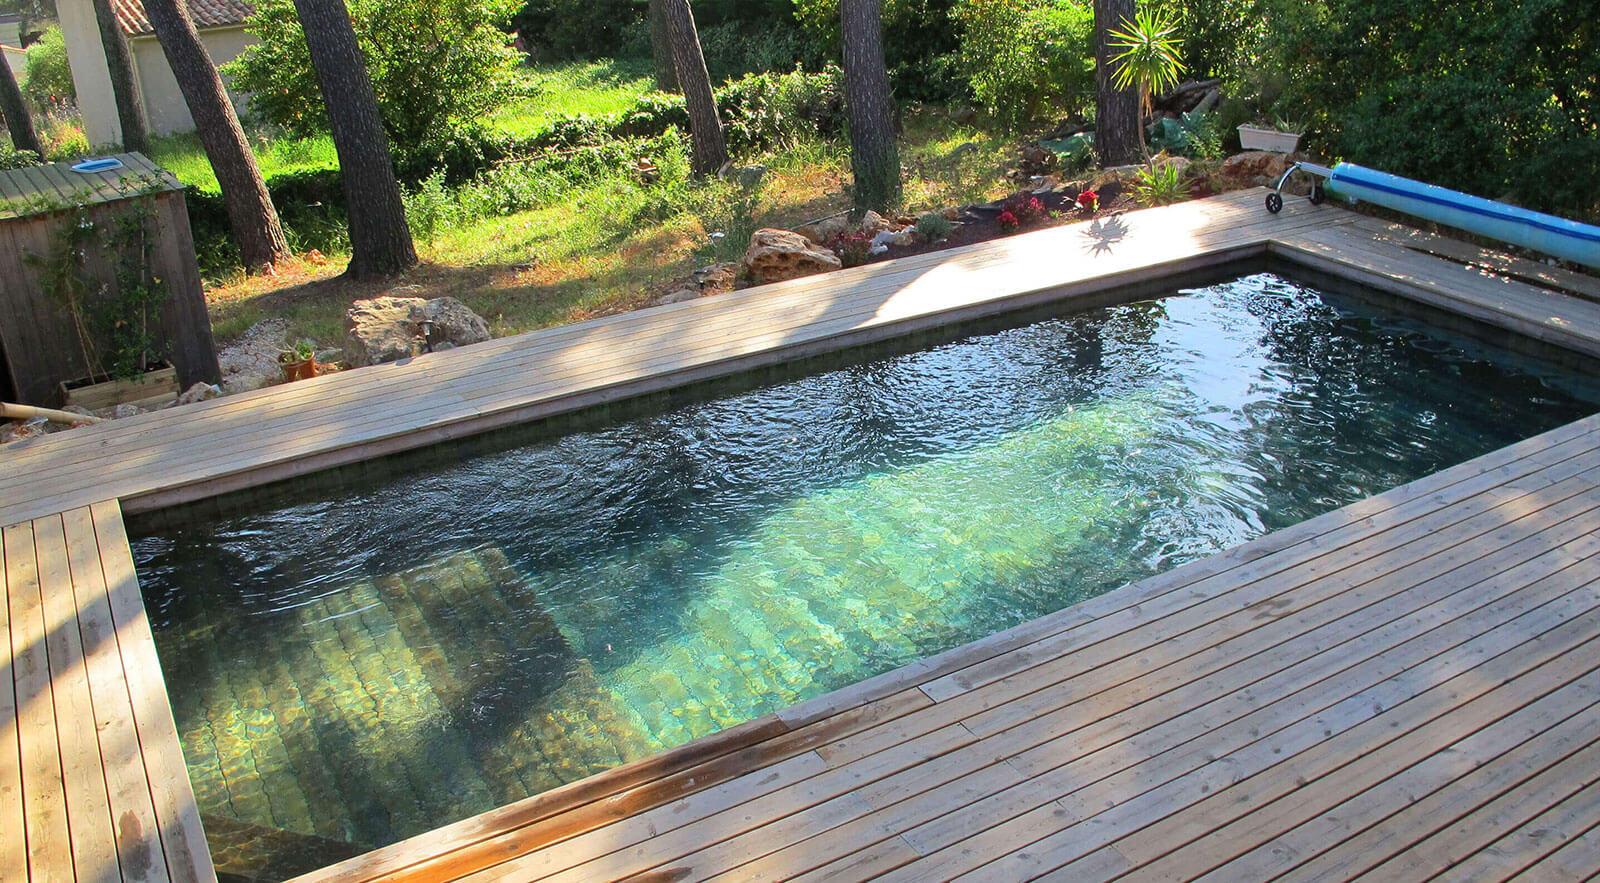 les mat riaux utilis s poru fabriquer une piscine natura. Black Bedroom Furniture Sets. Home Design Ideas